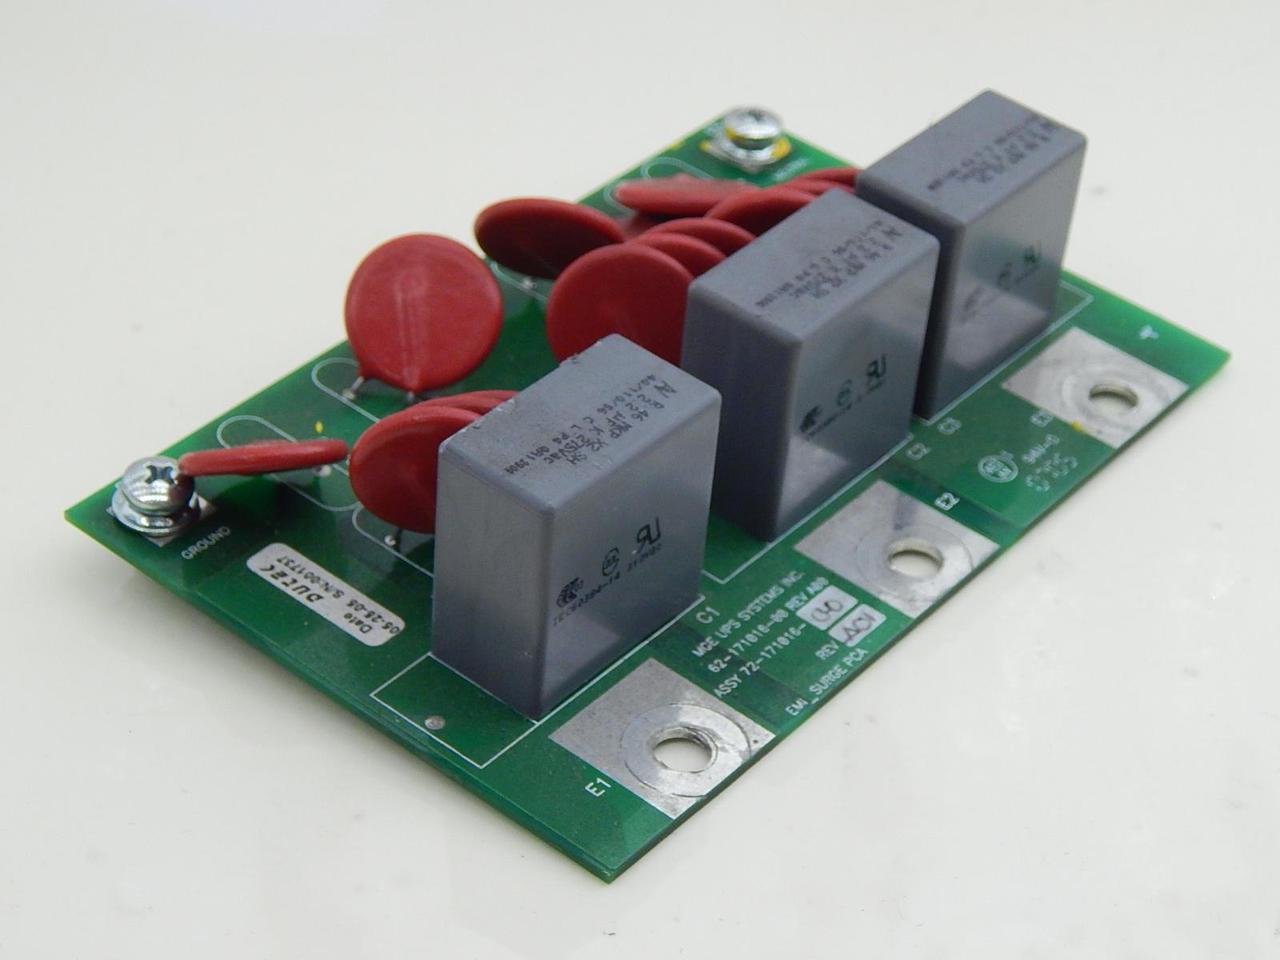 MGE UPS Systems 62-171016-00, 72-171016-00 EMI_Surge PCA Board T91291